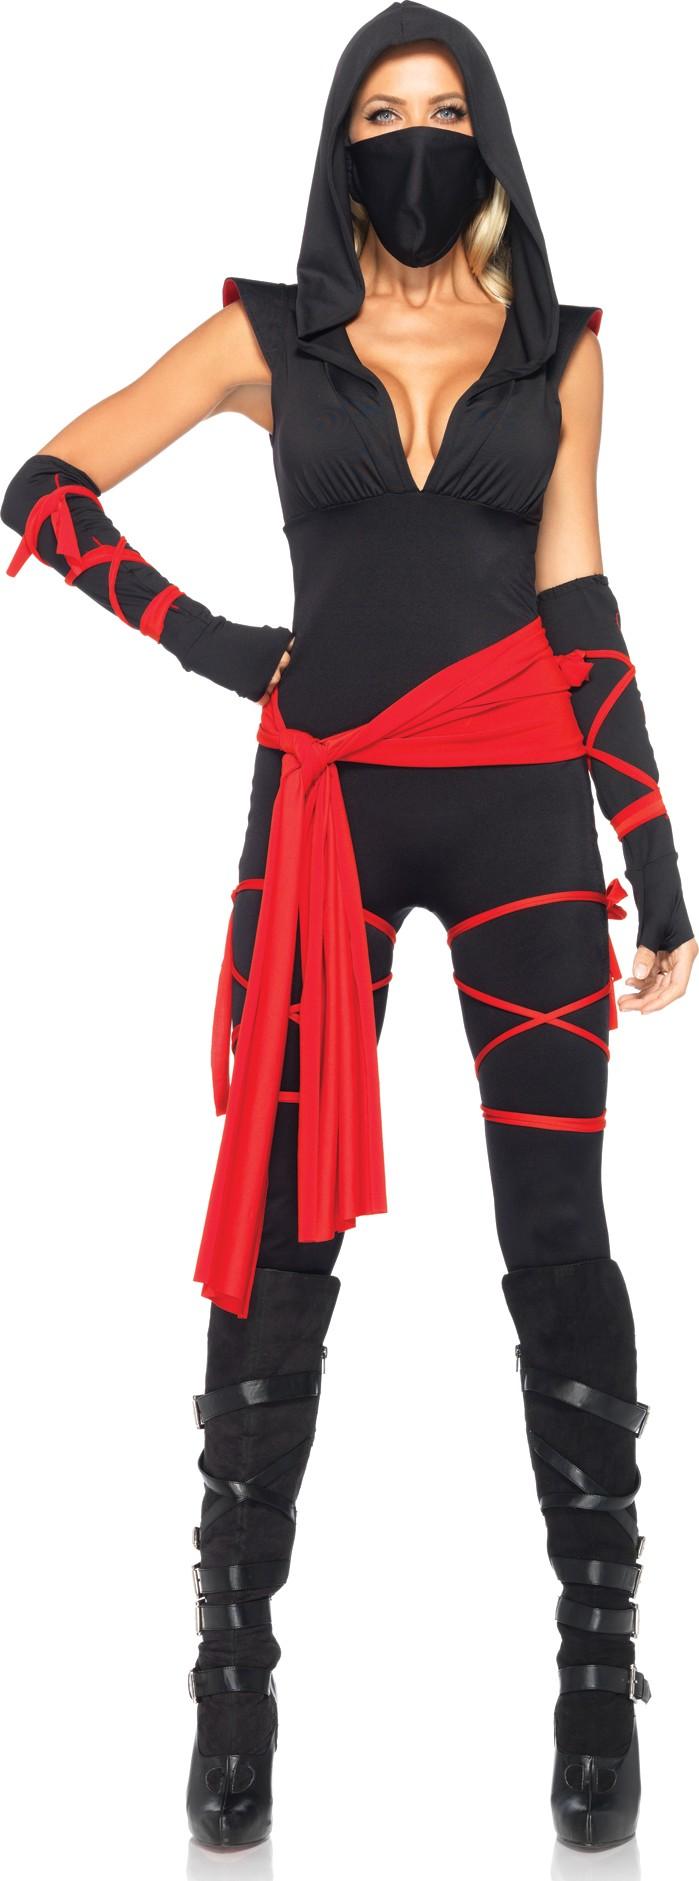 deguisement ninja femme